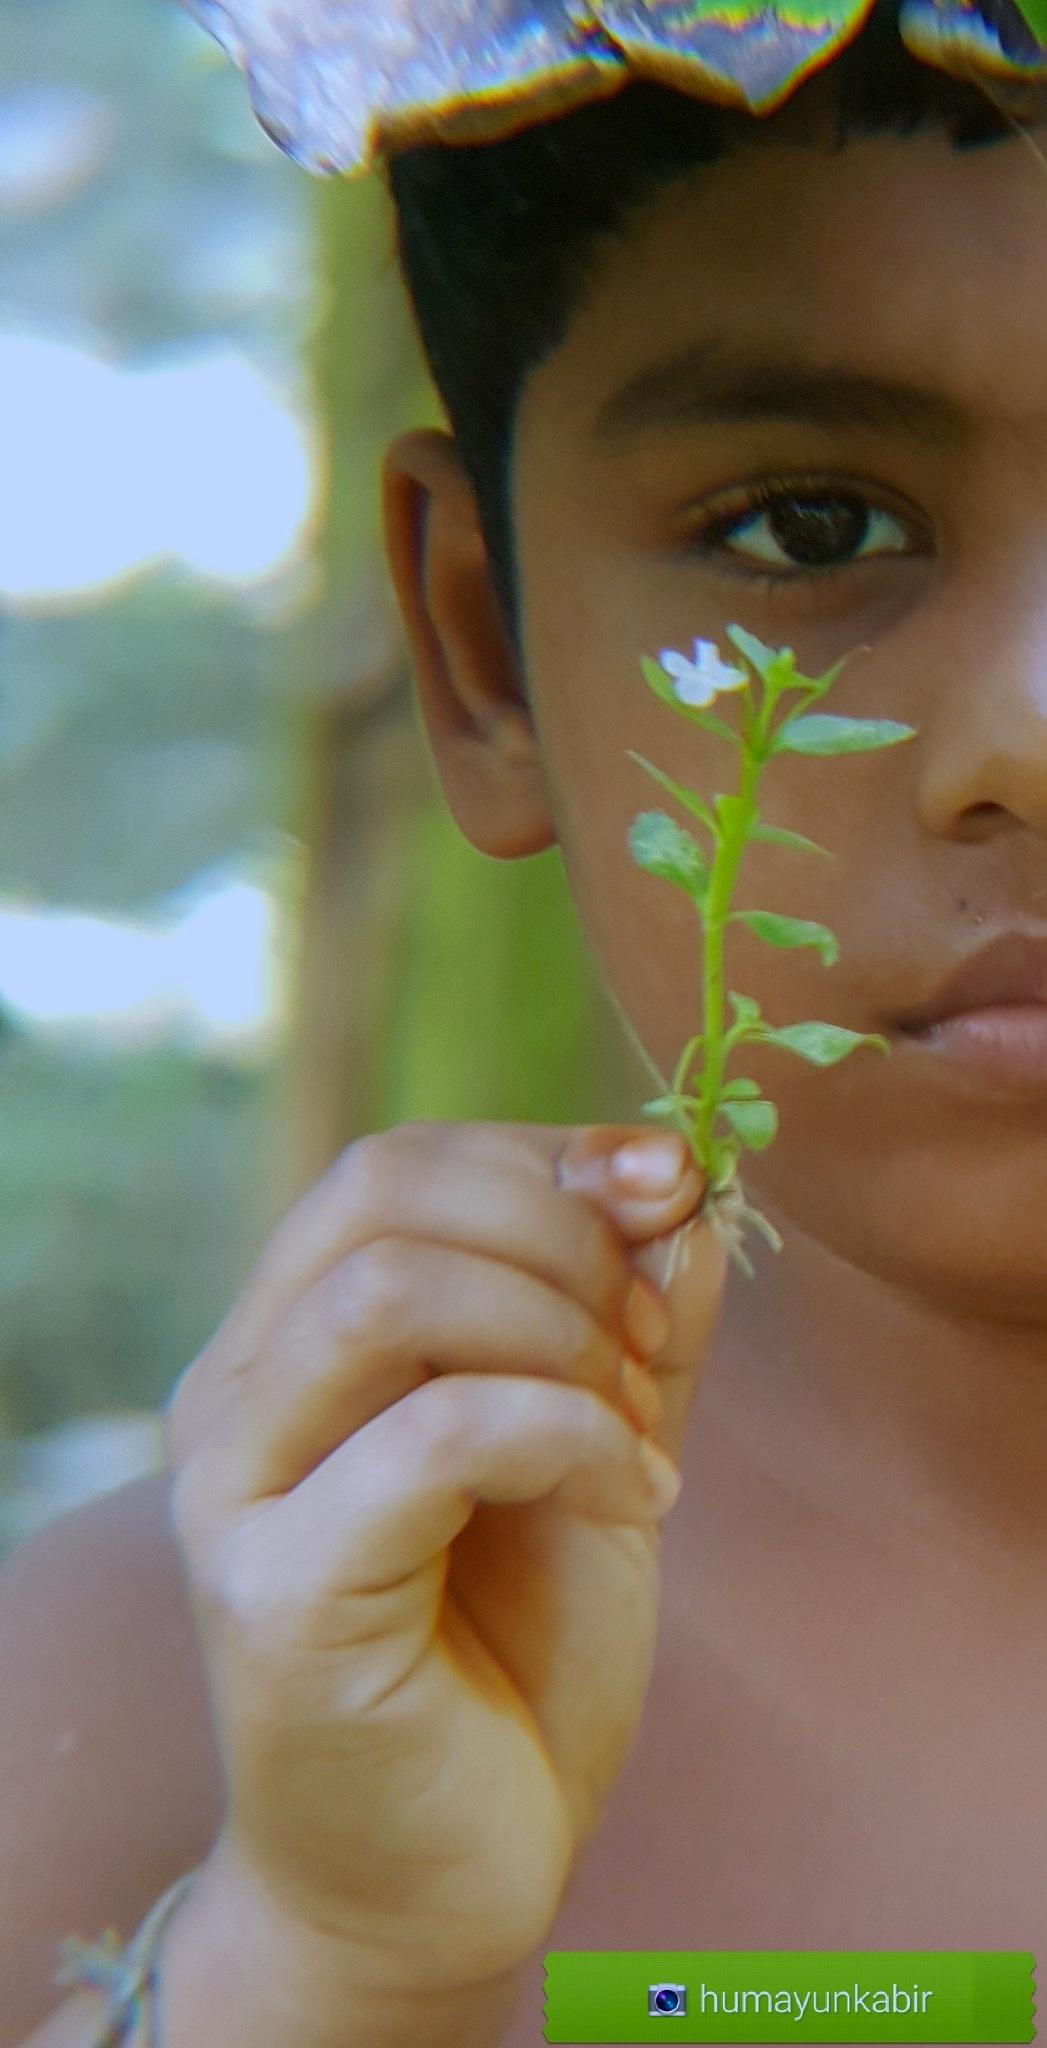 Untitled by humayun kabir